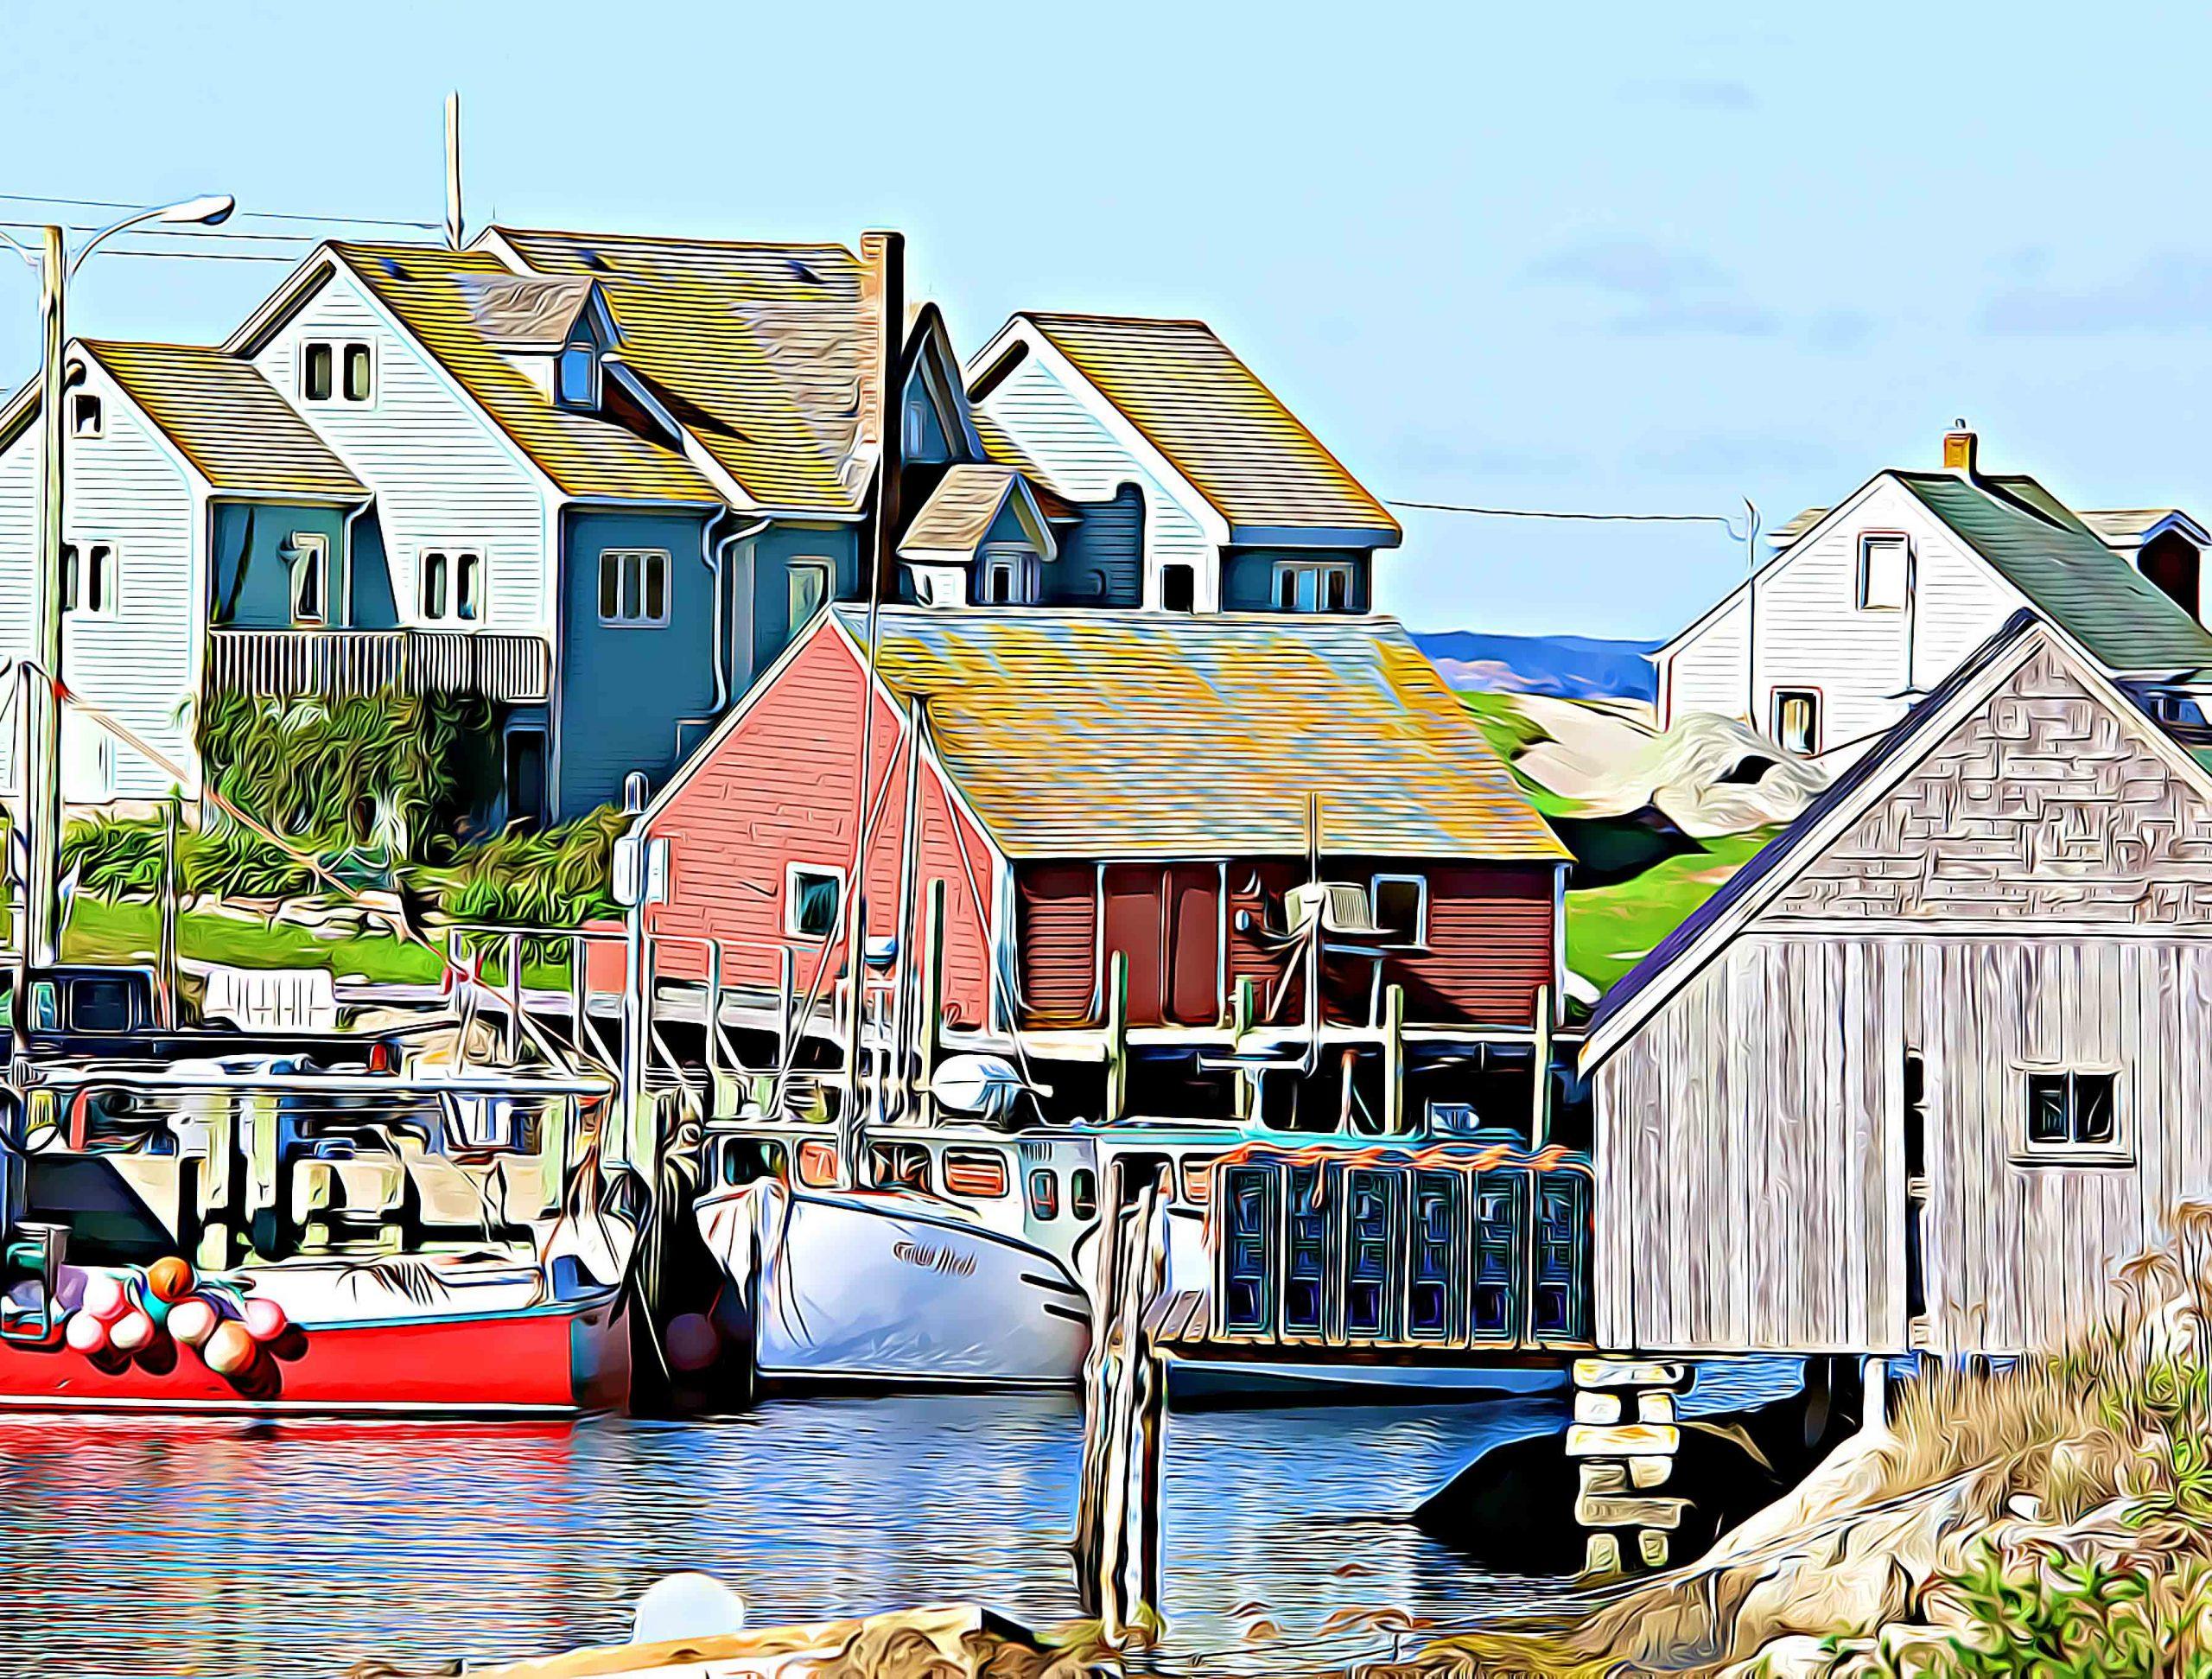 Boat Houses of Nova Scotia photo